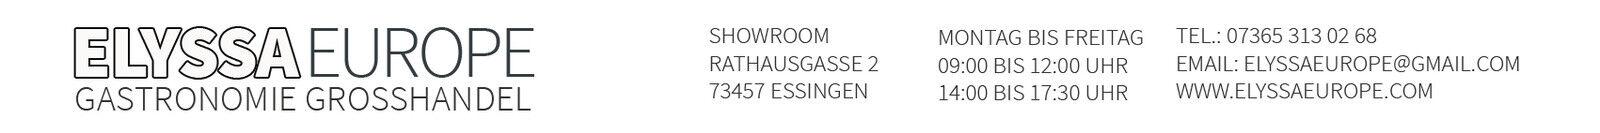 ElyssaEurope-Shop